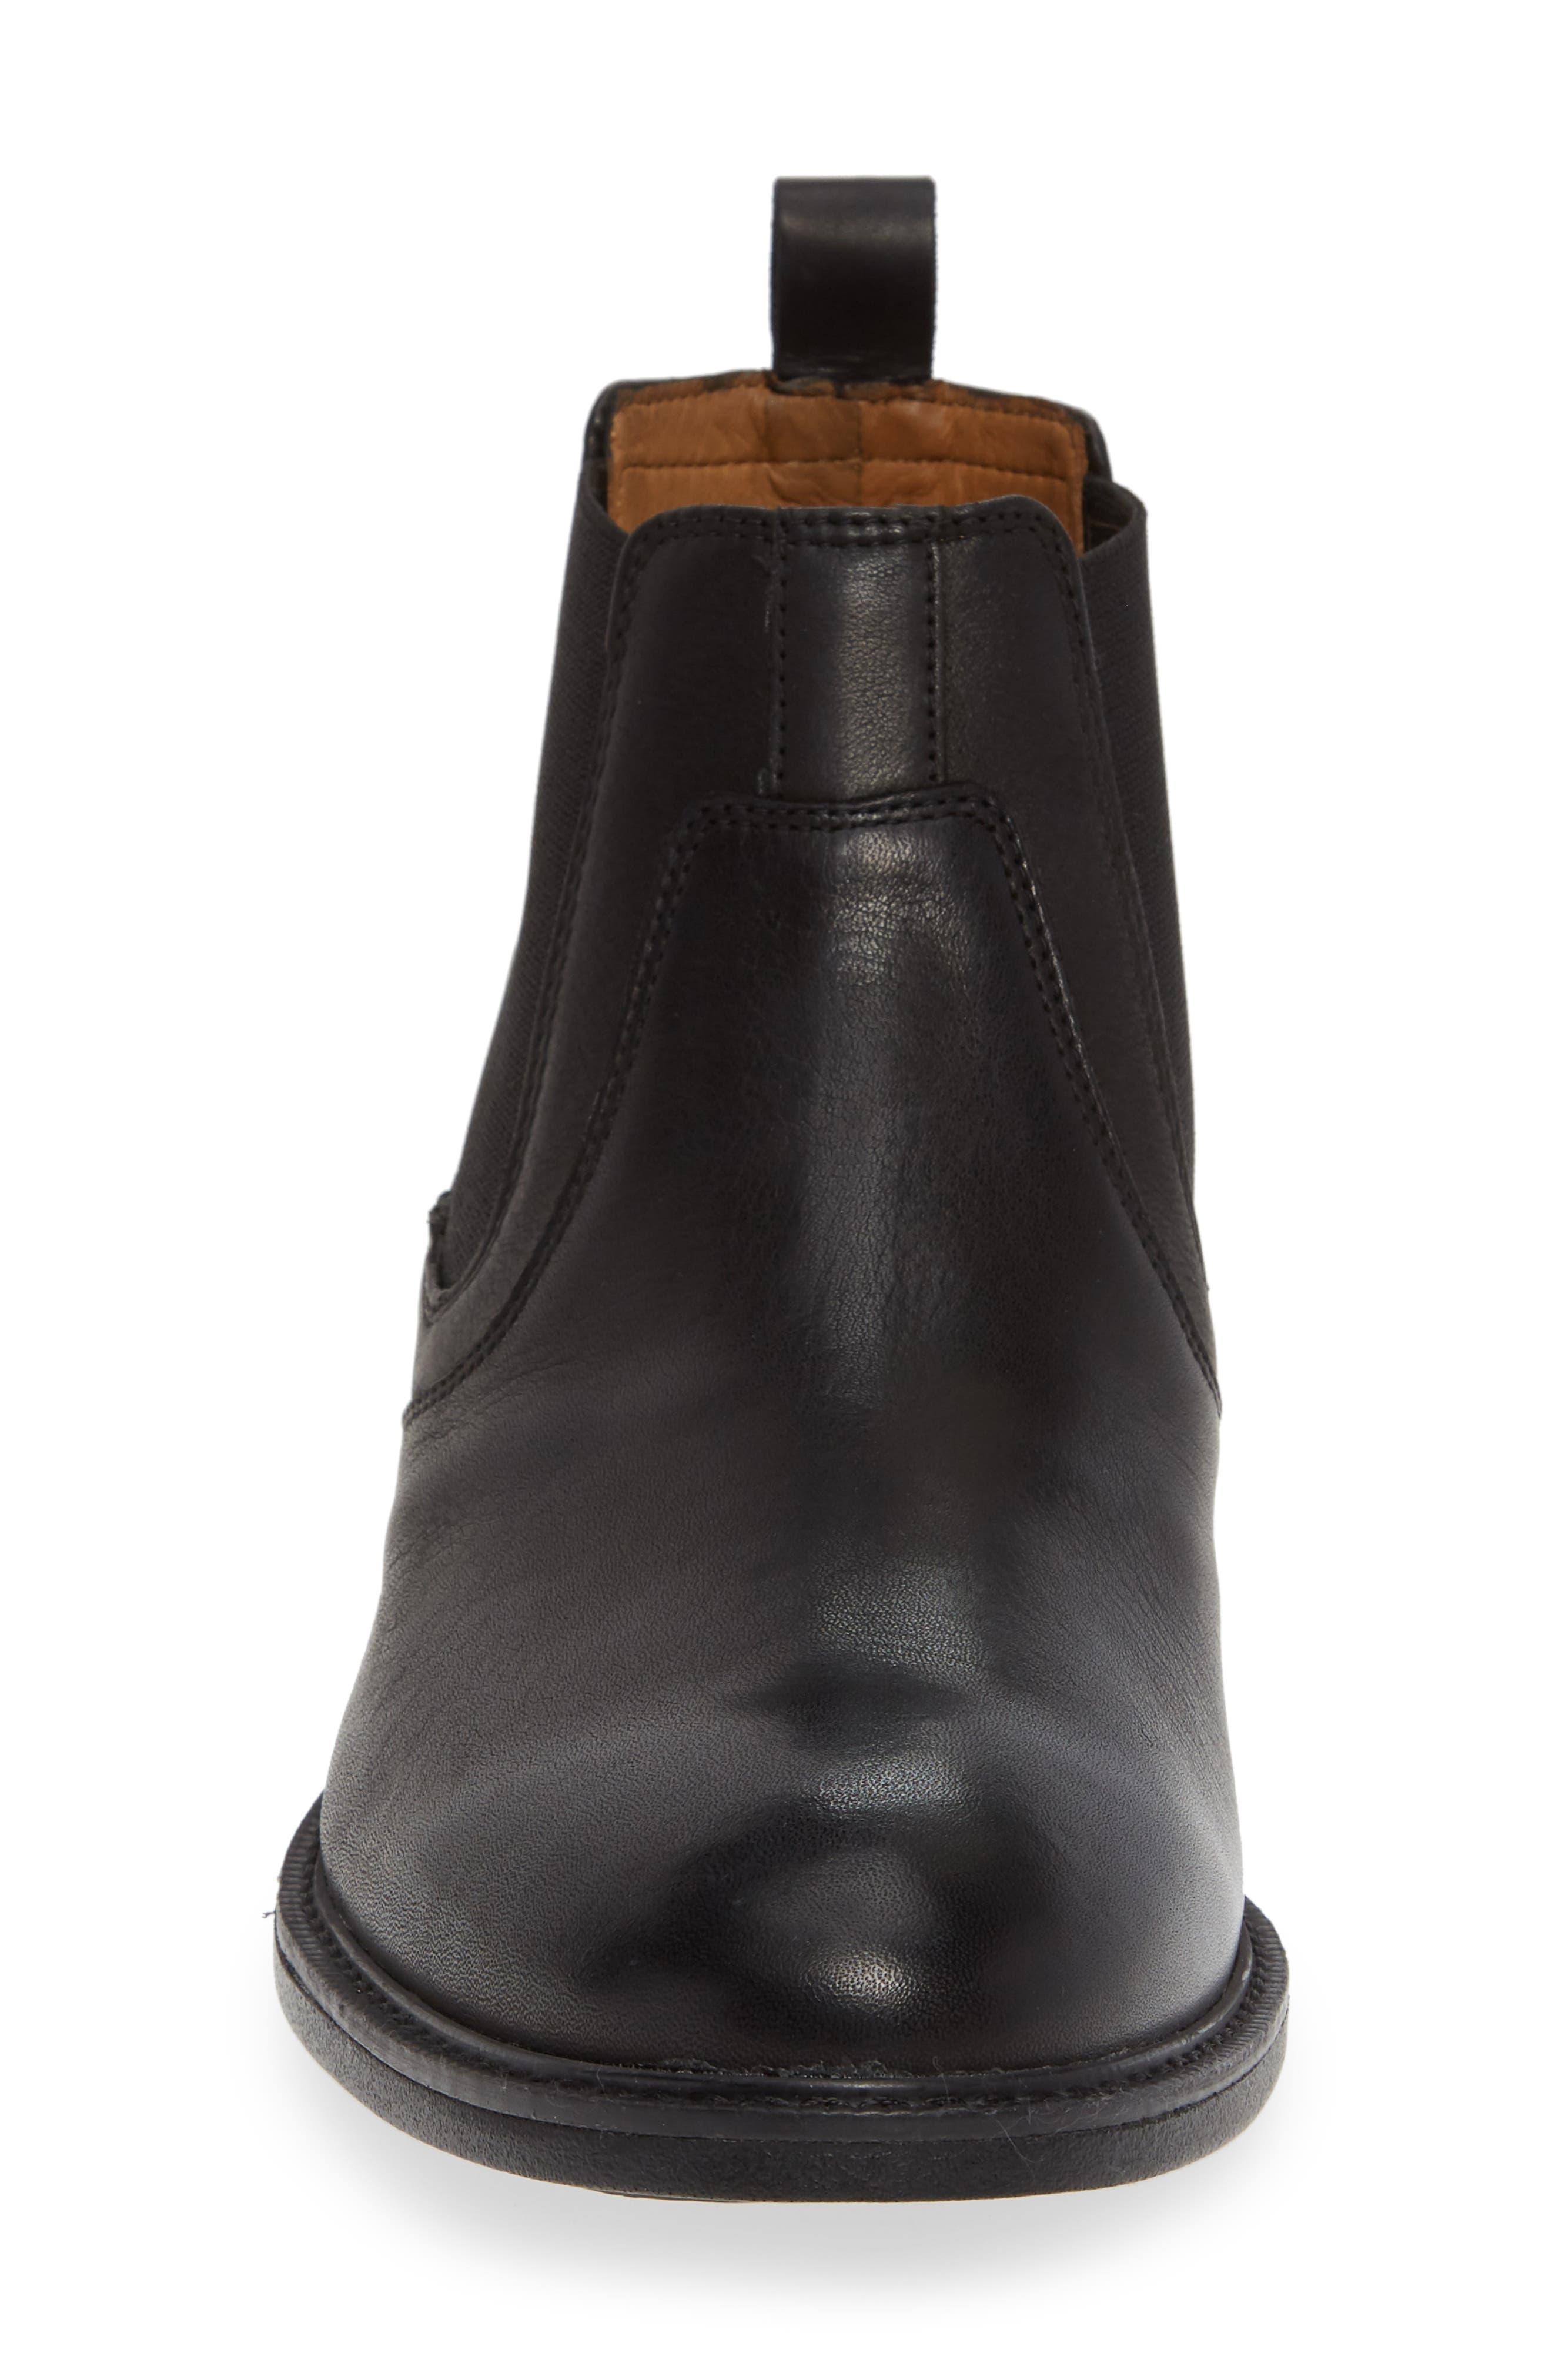 Hollis Waterproof Chelsea Boot,                             Alternate thumbnail 4, color,                             BLACK LEATHER